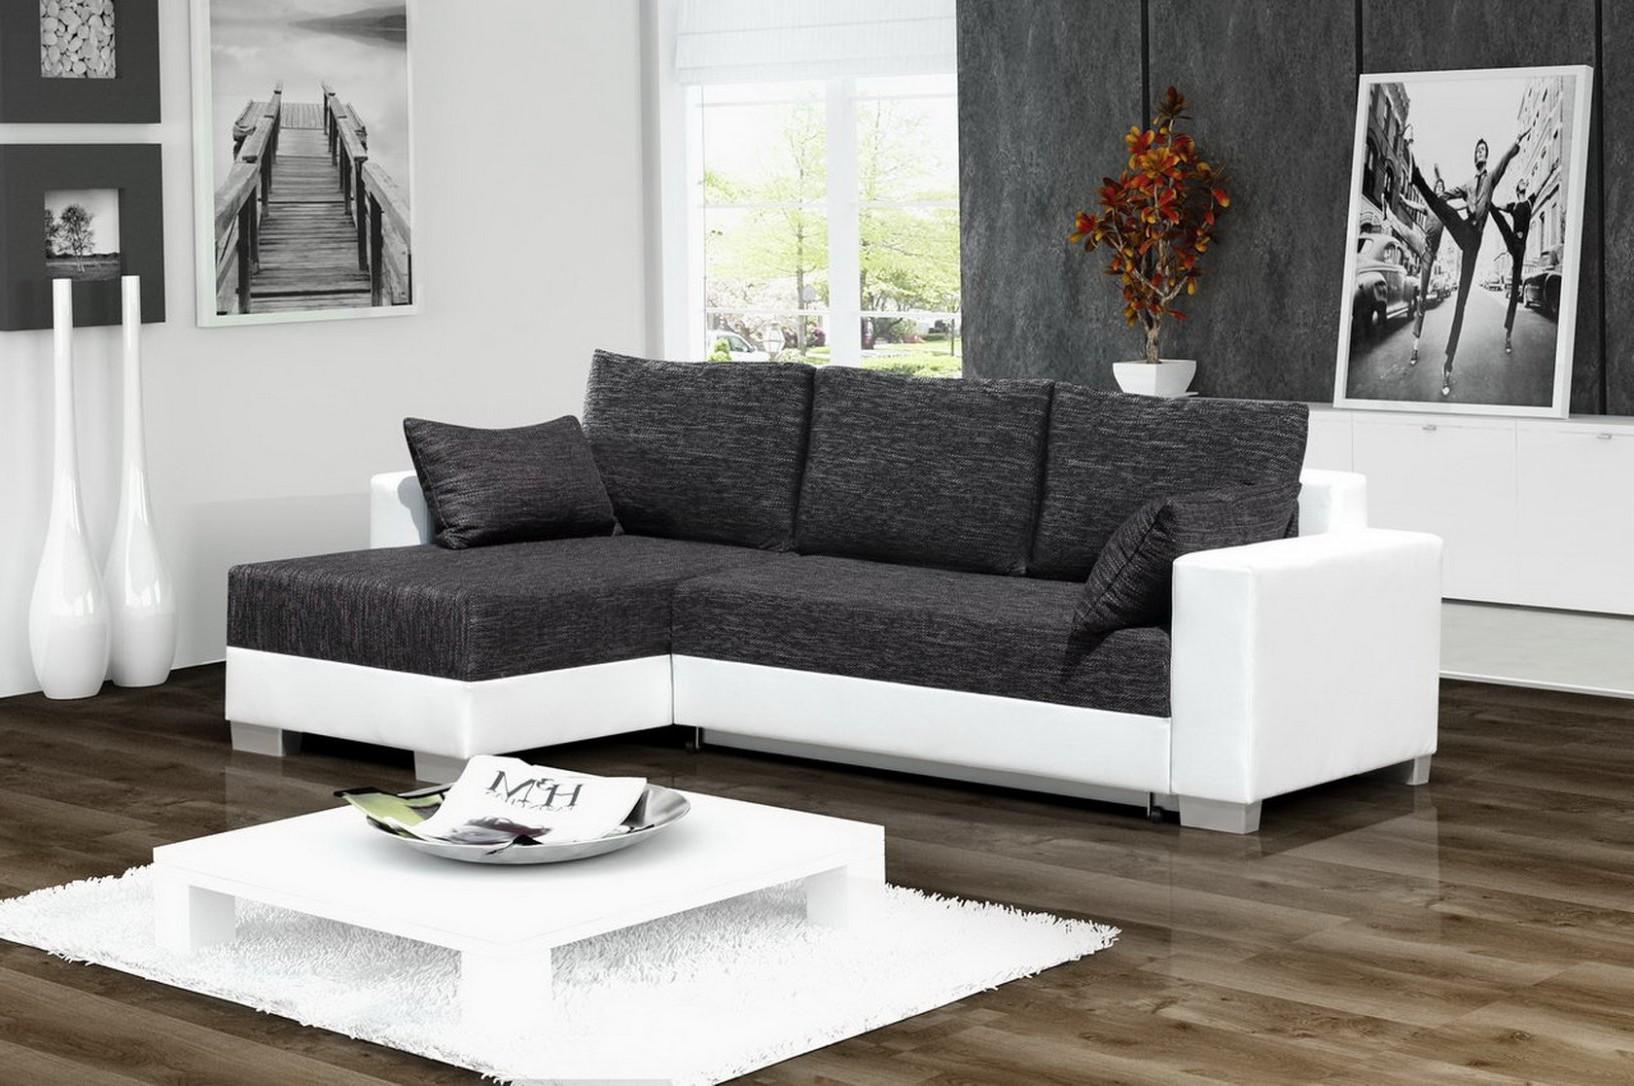 Canapé D'angle Convertible Simili Cuir Blanc